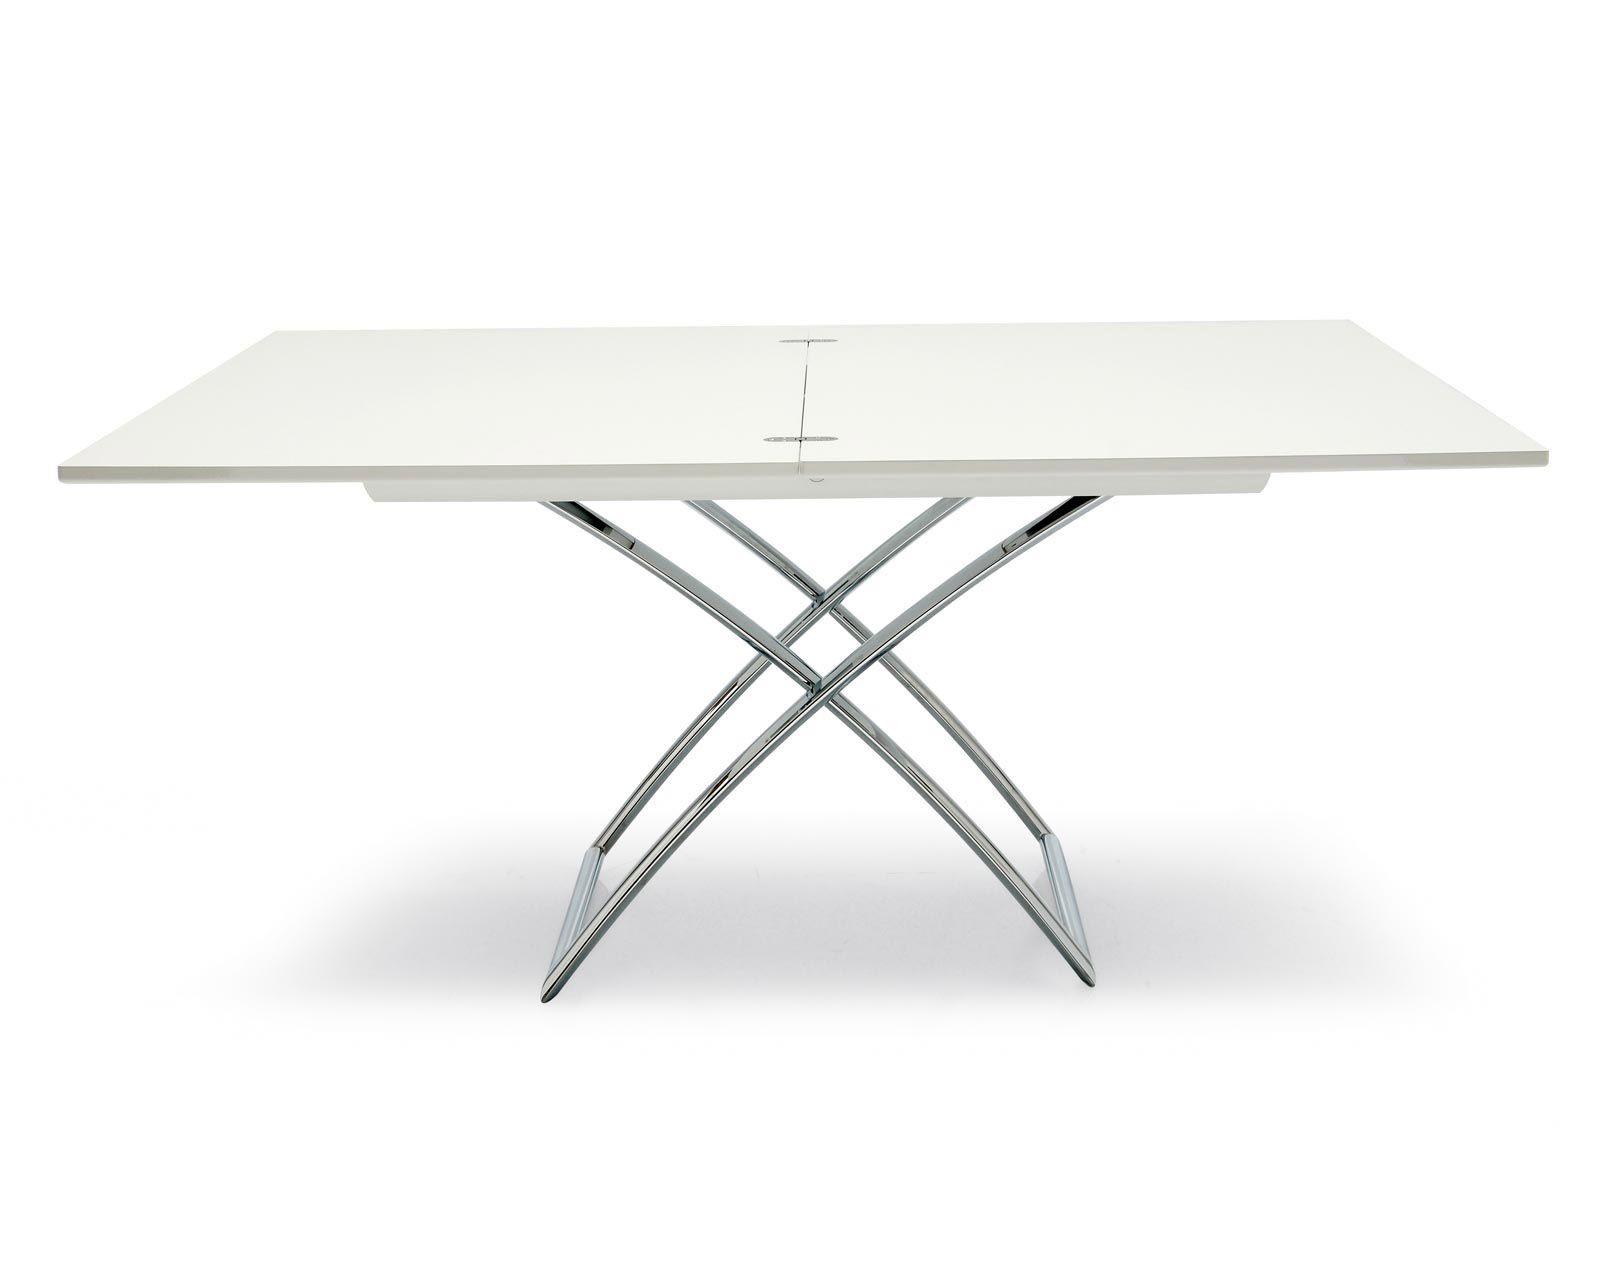 Calligaris Magic J Table Adjustable Height Adjustable Height Table Folding Coffee Table Extending Table [ 1280 x 1600 Pixel ]